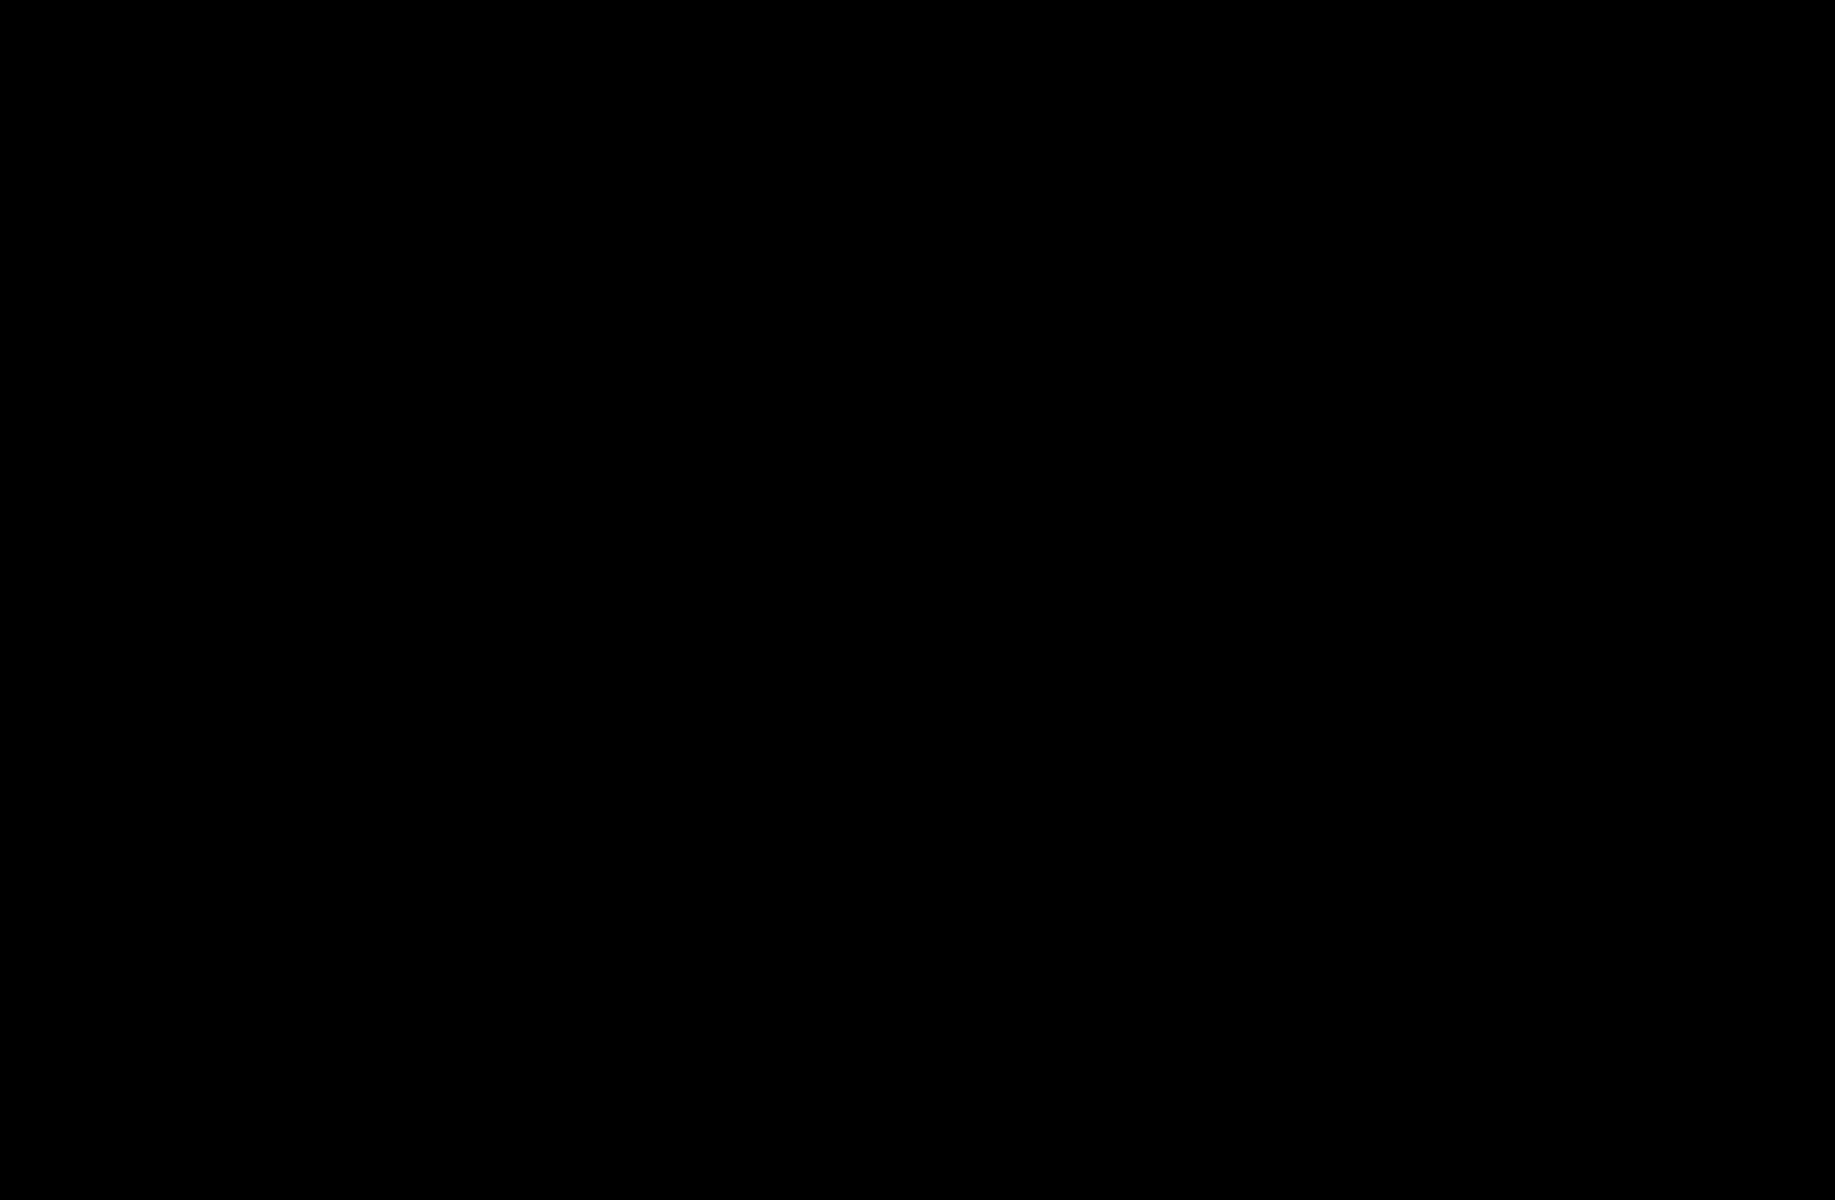 __free_ref_sheet_lineart___by_mysatheunknown-d55m7eg.png